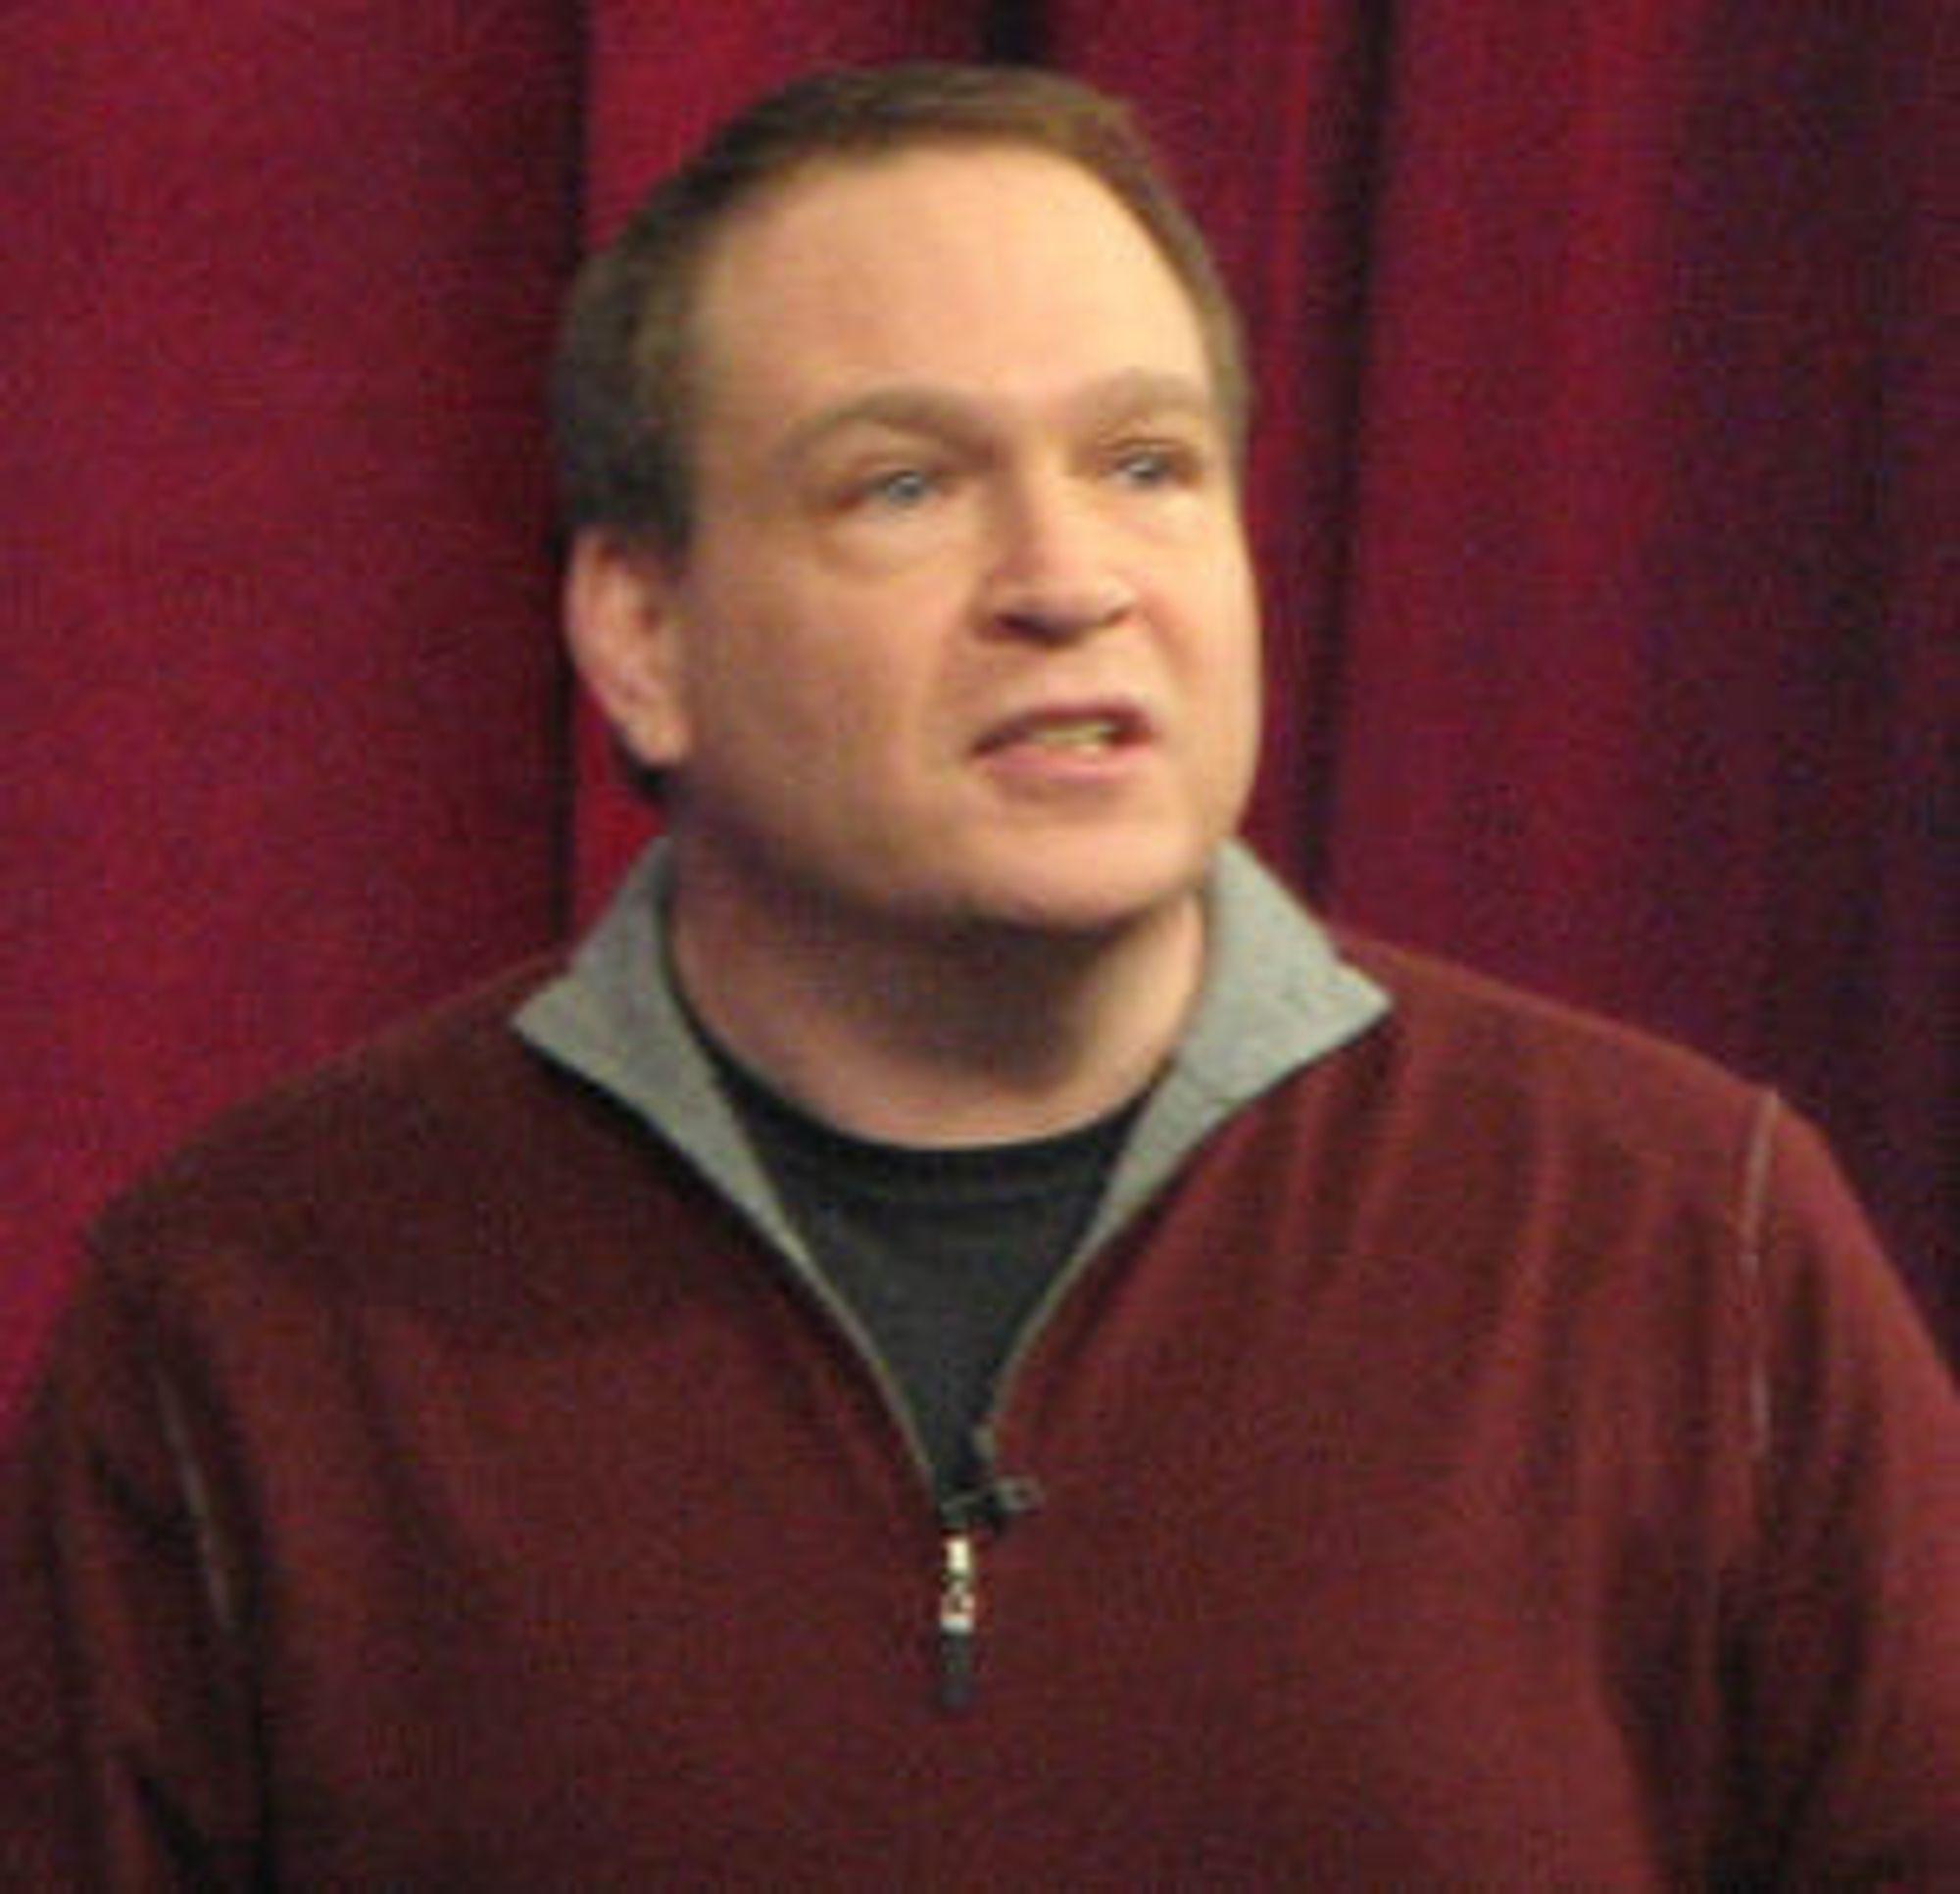 Bob Muglia under PDC 2009